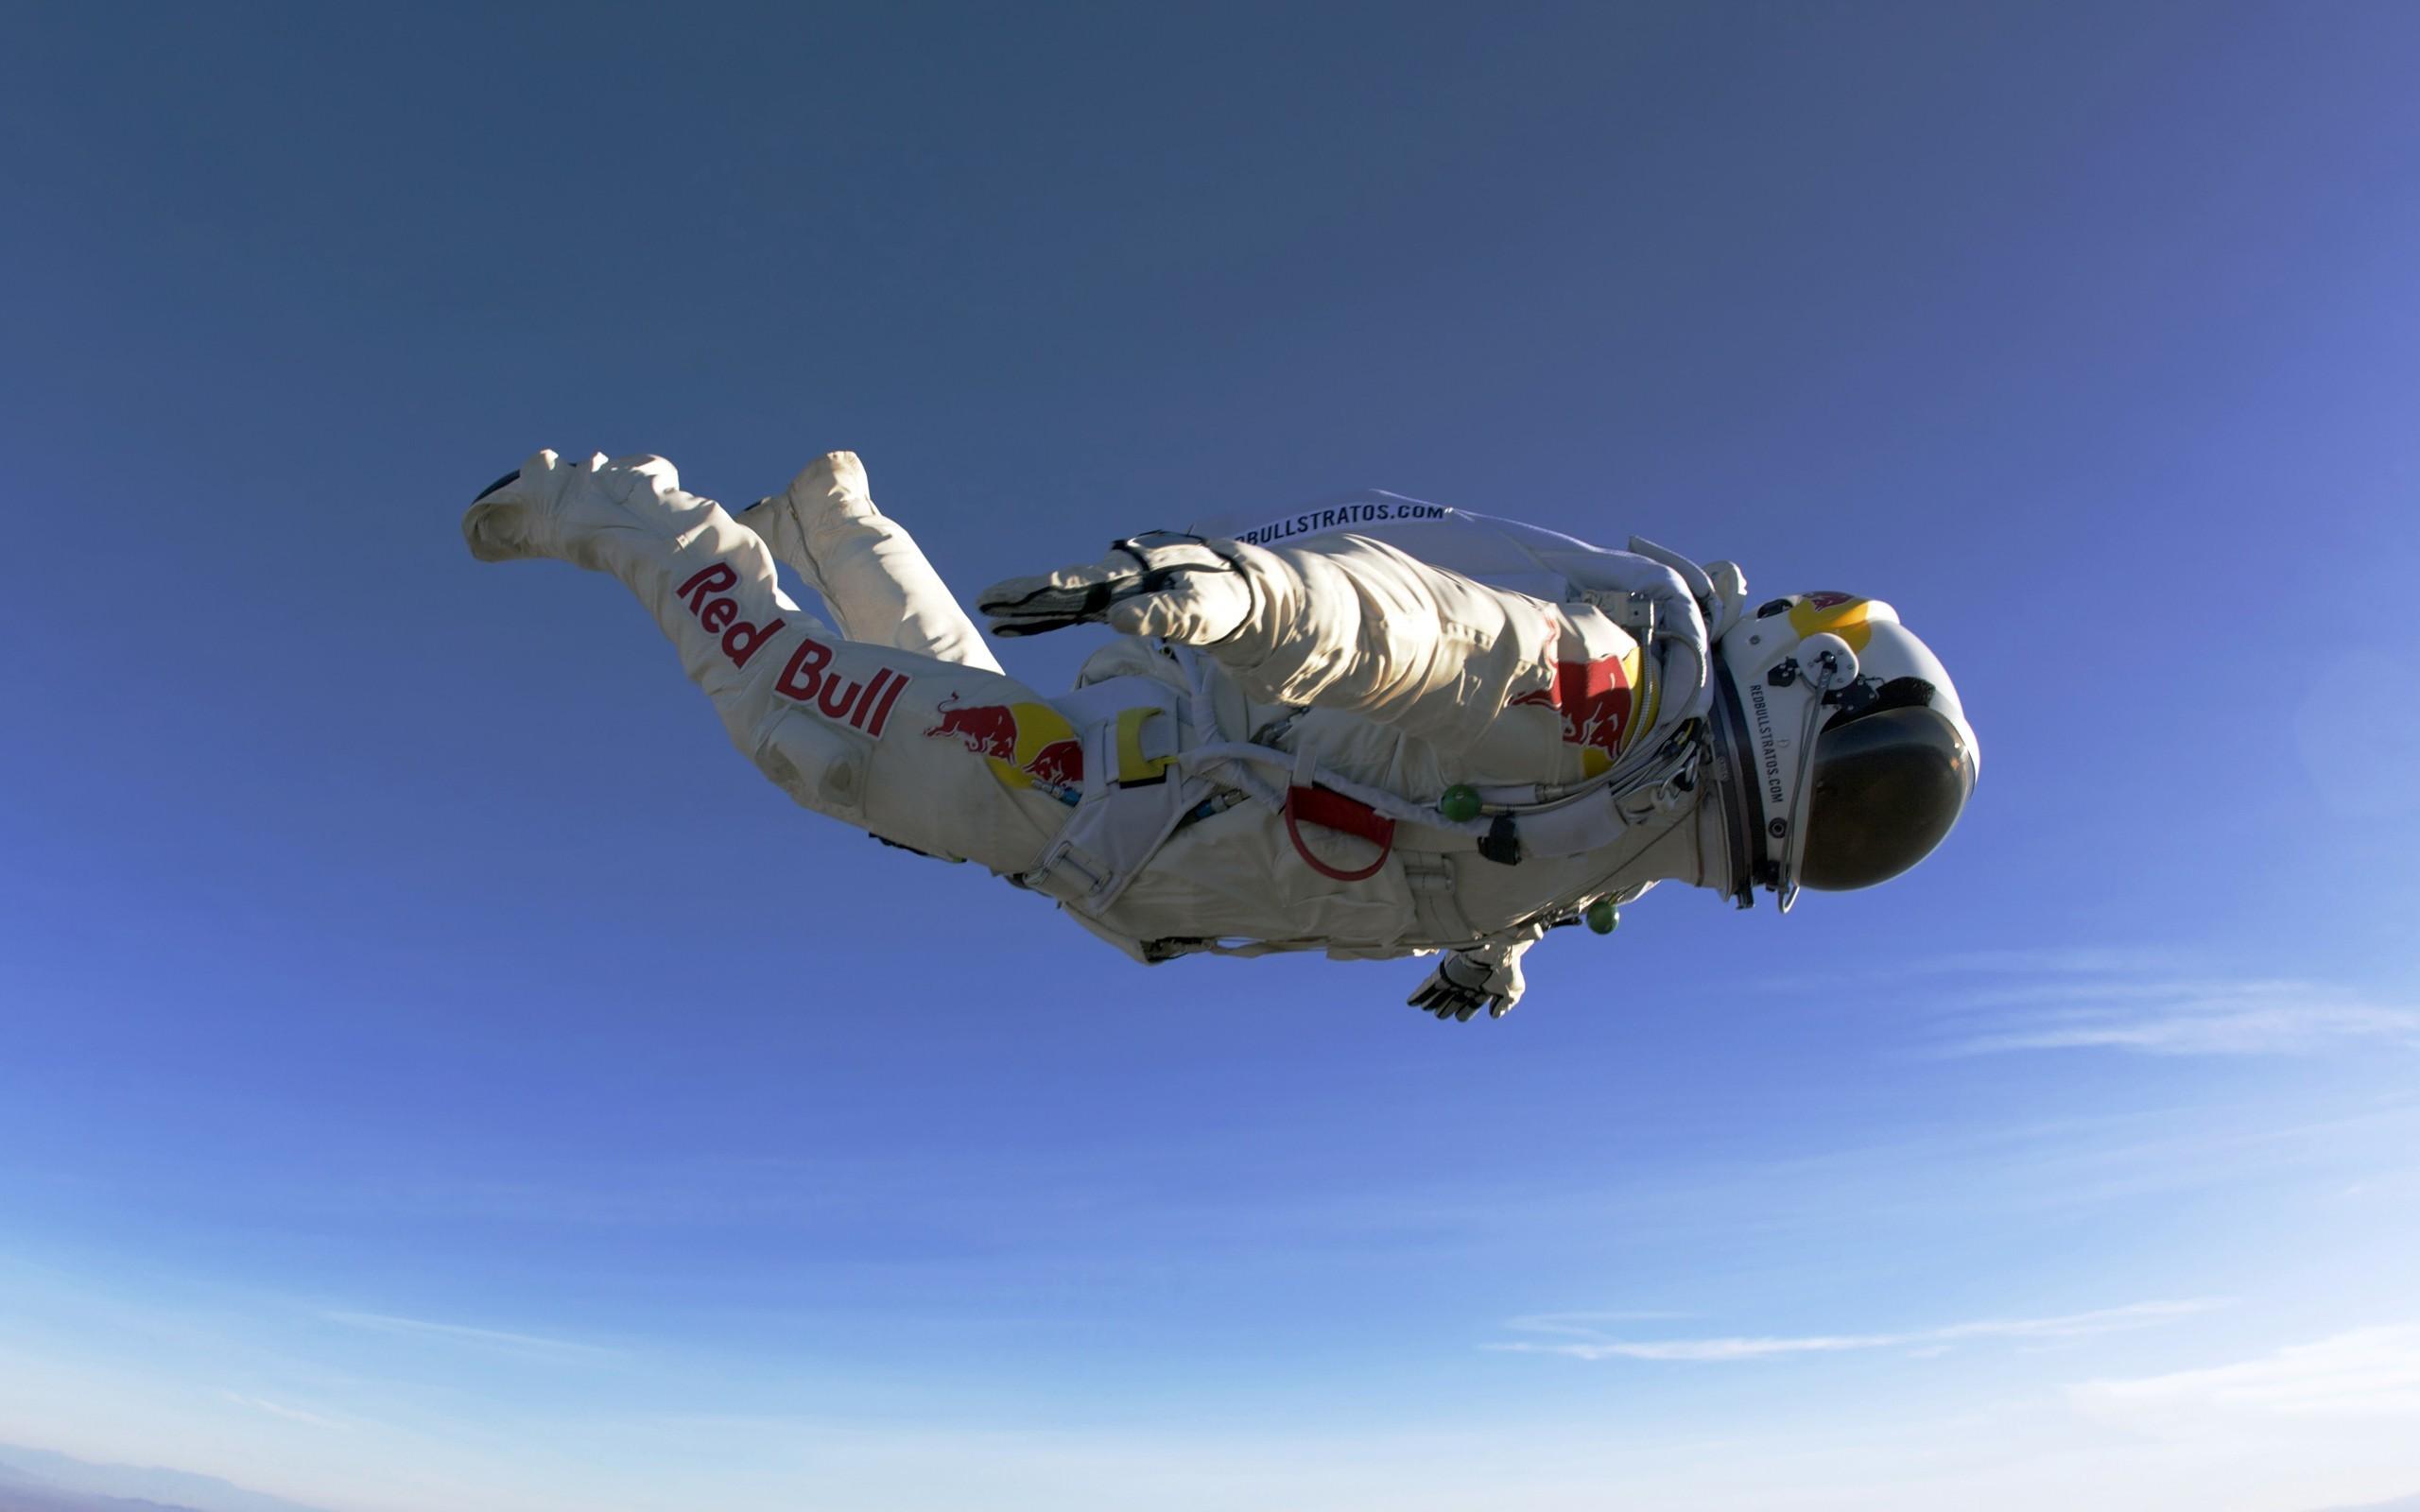 General 2560x1600 Red Bull sky diving Felix Baumgartner skydiver skydiving